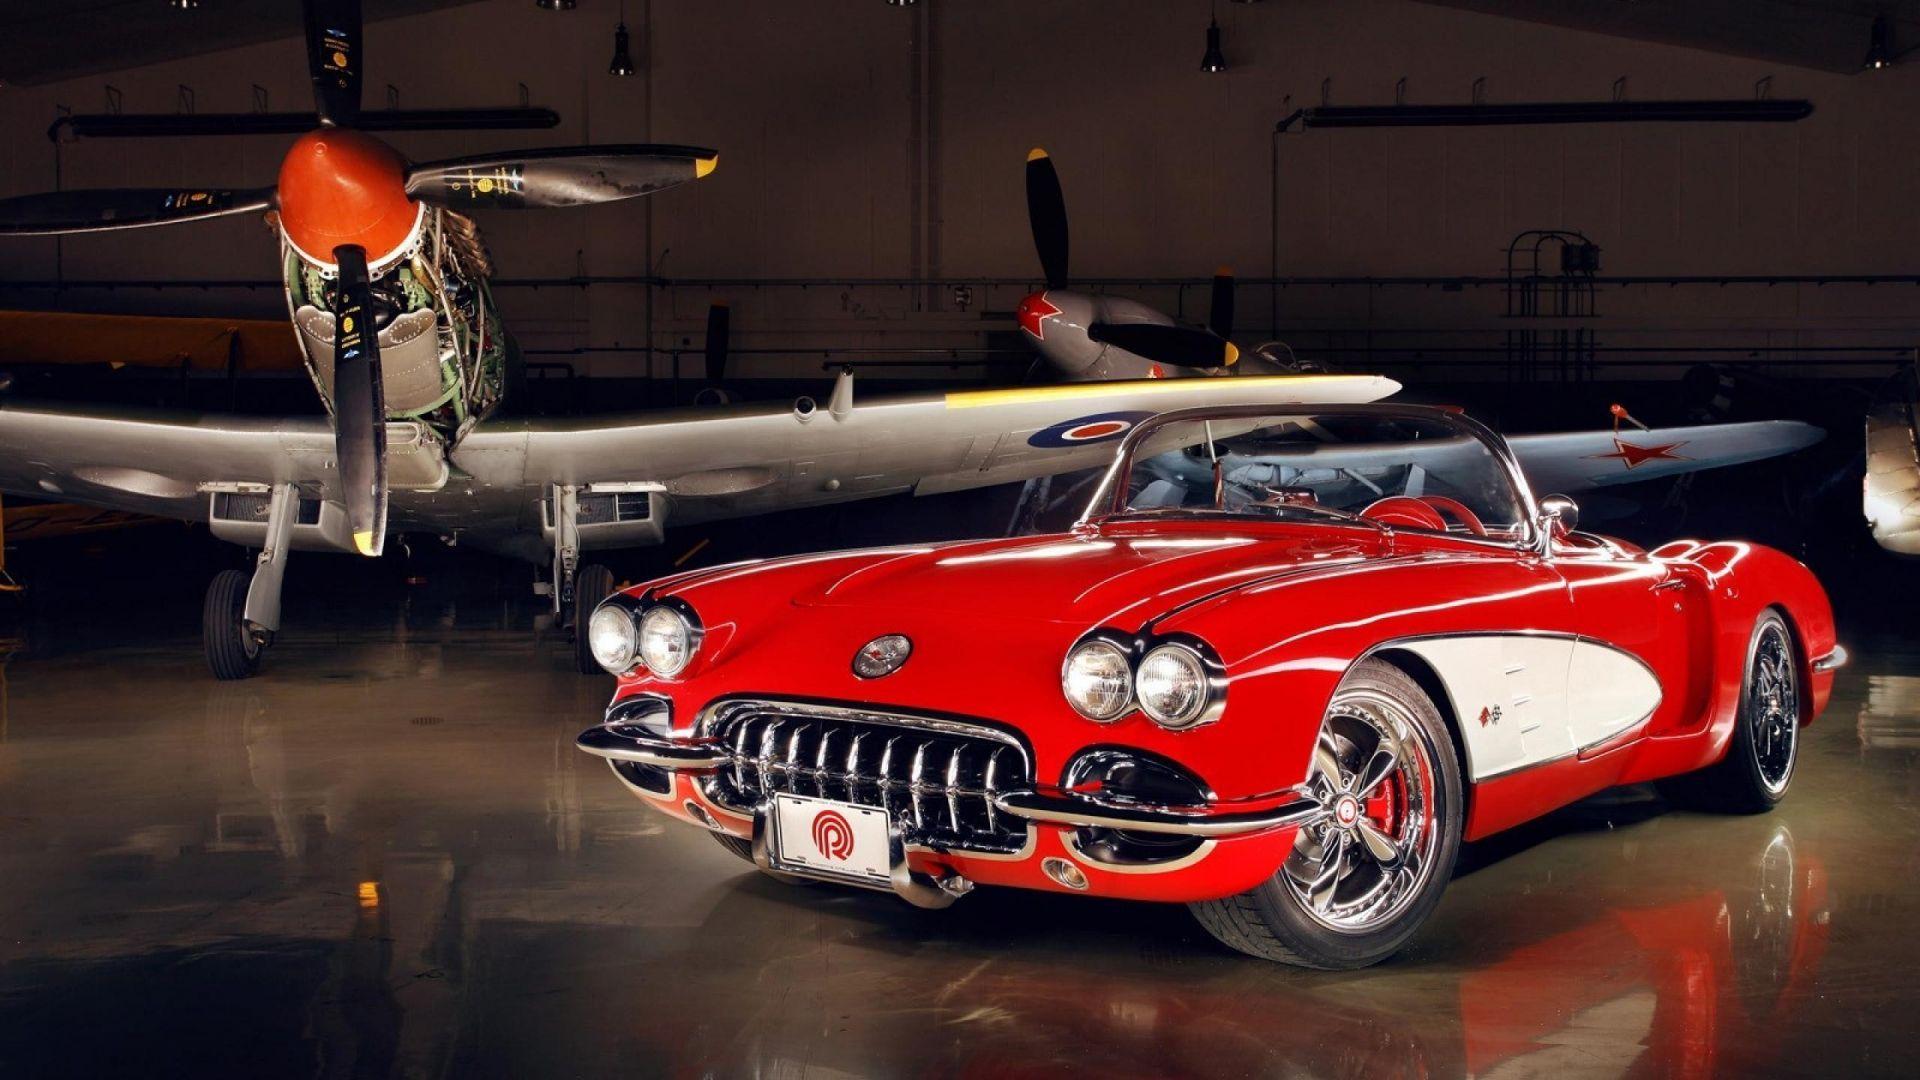 Wallpaper Chevrolet Corvette (C1), red classic car, airplane